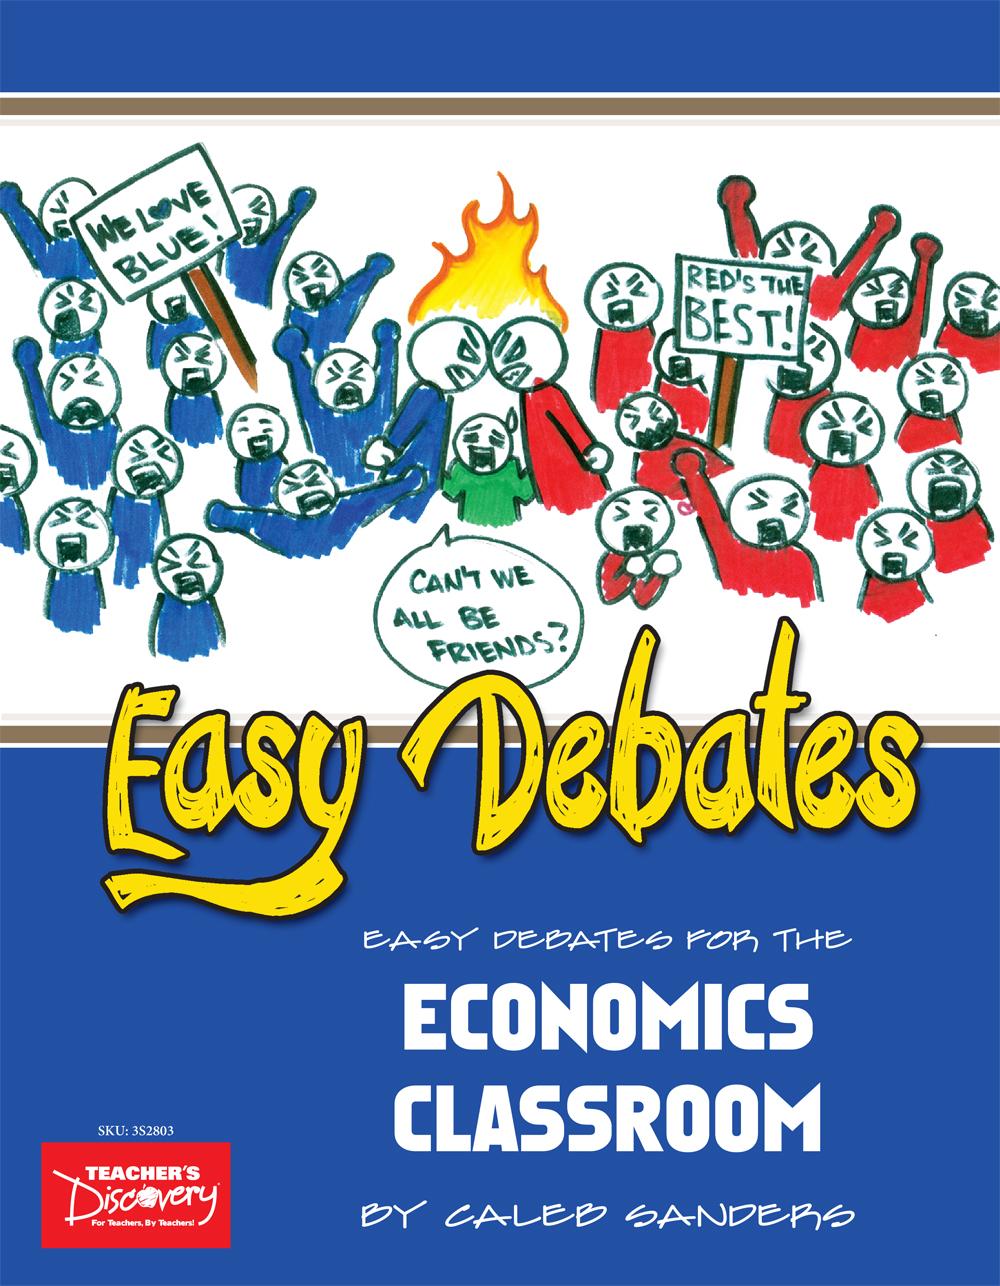 Easy Debates for the Economics Classroom Book